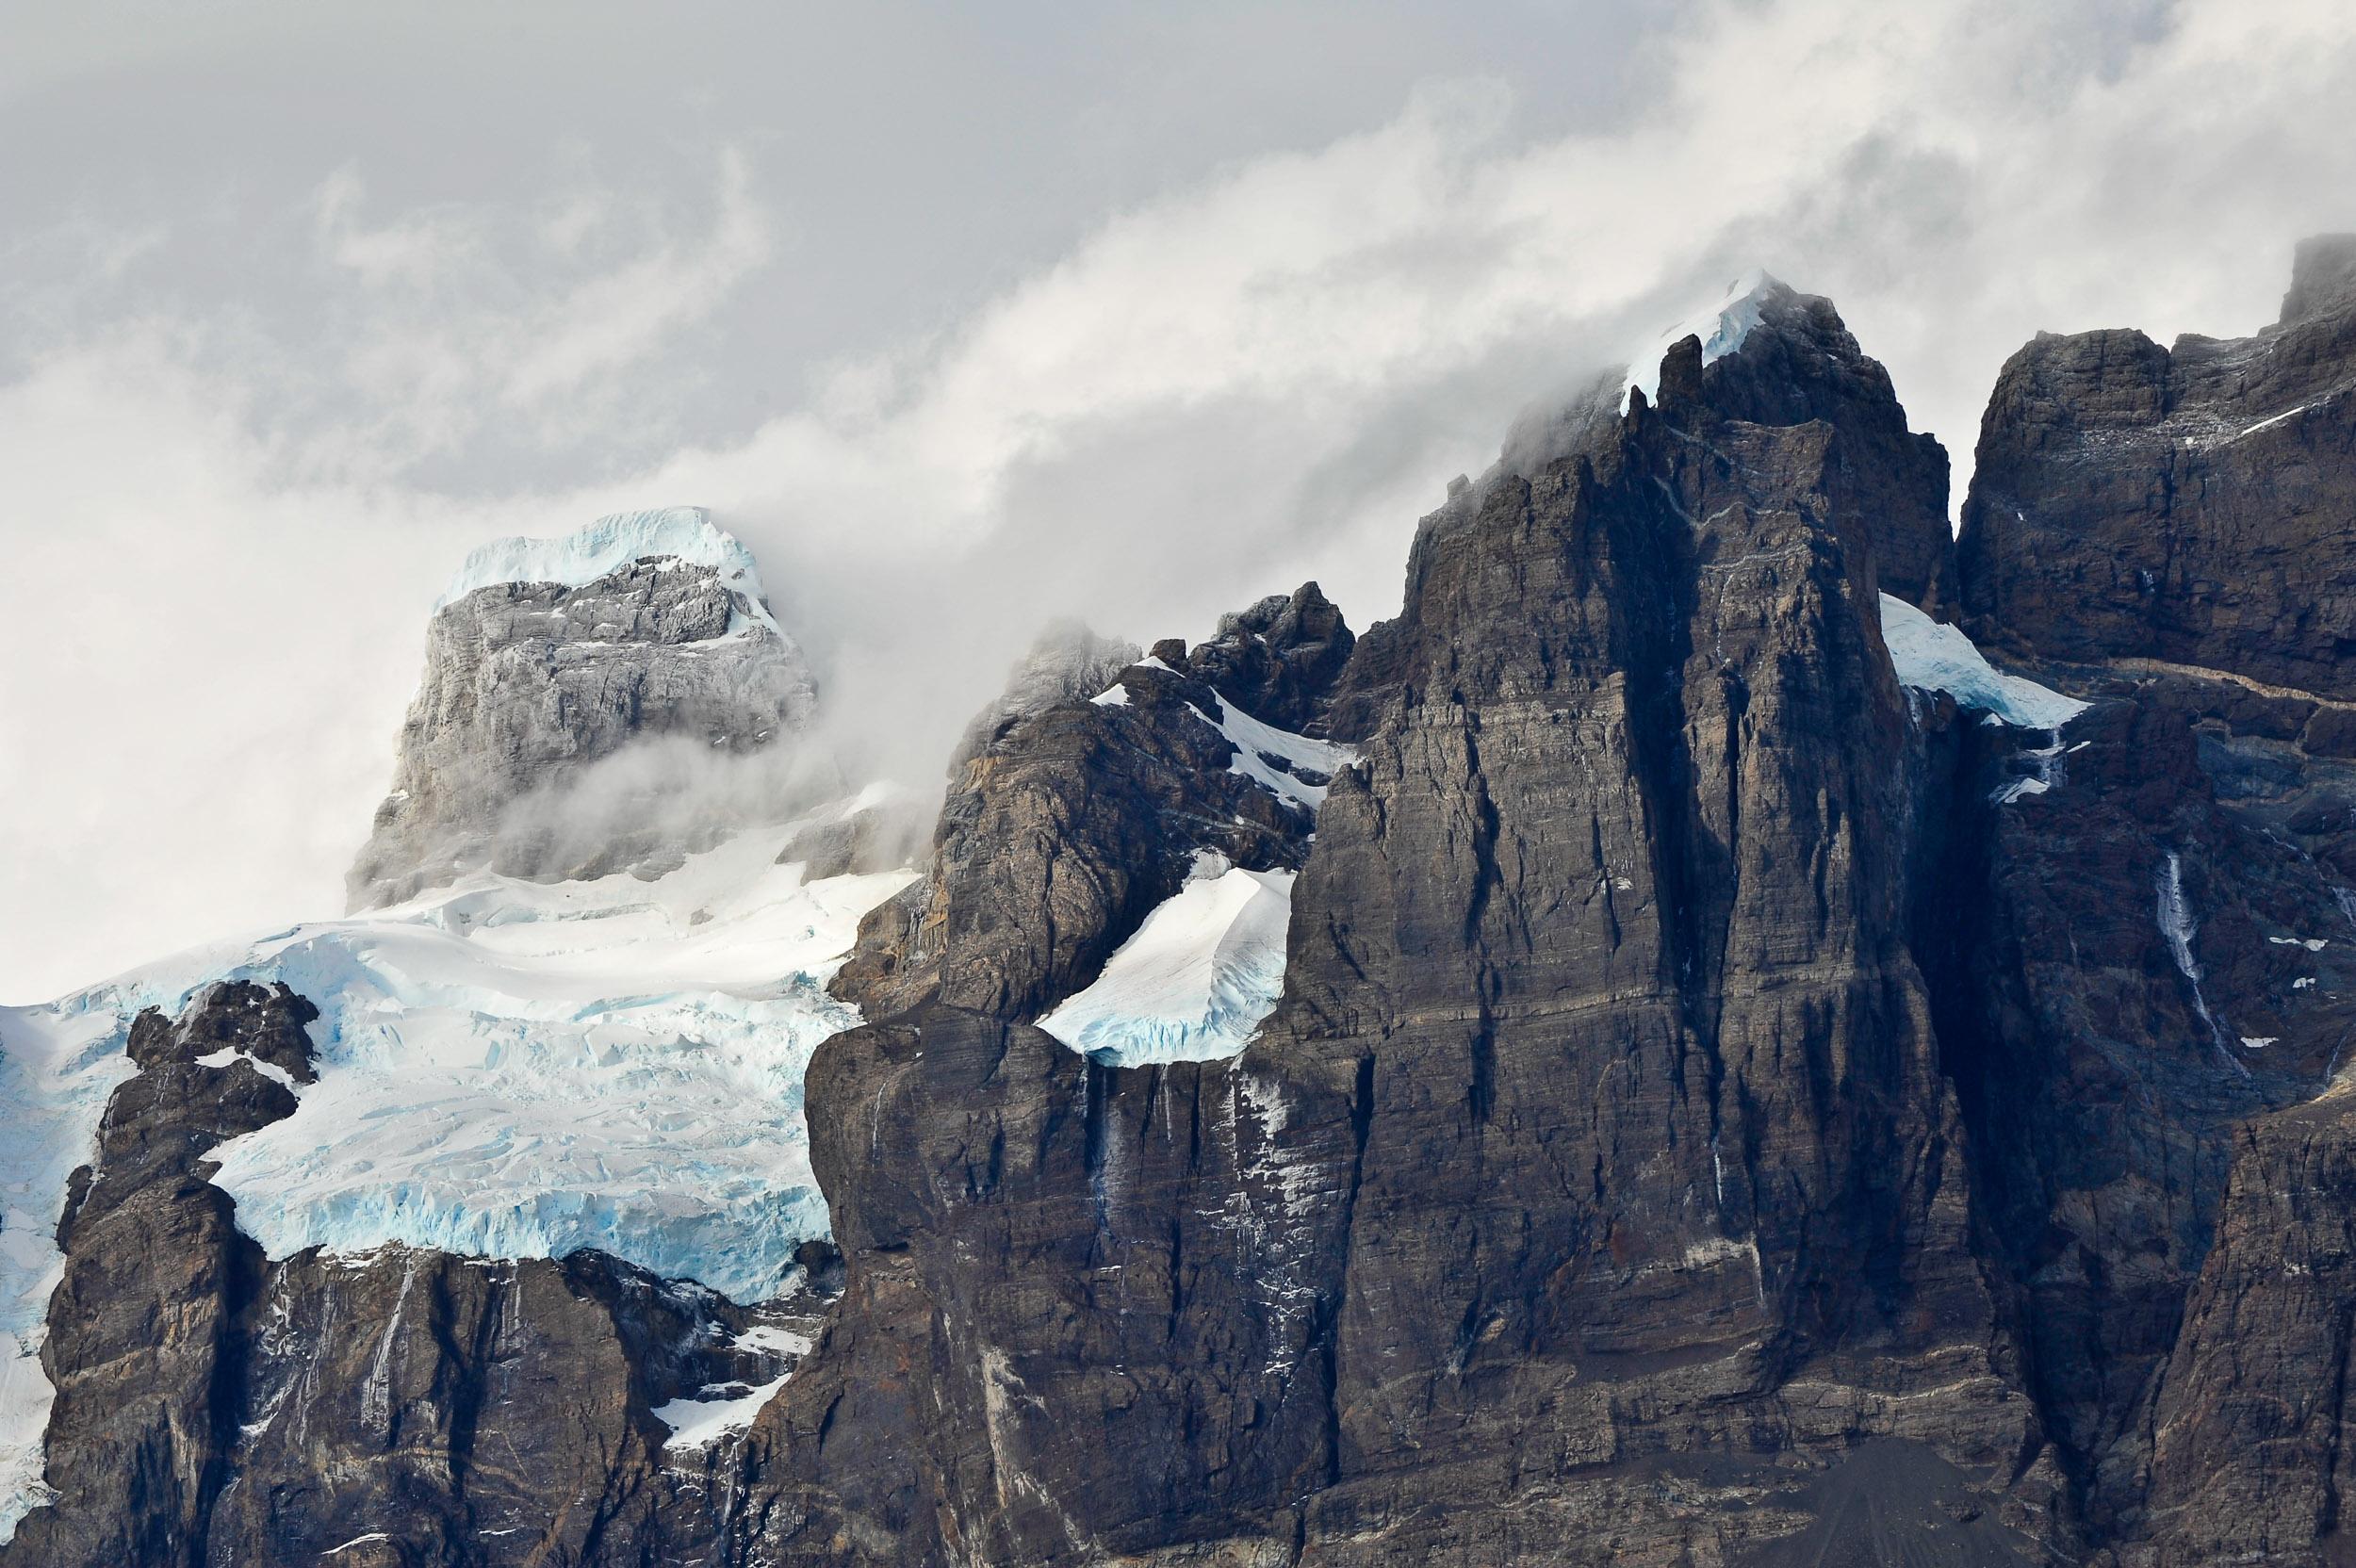 Mountain landscape - Chile